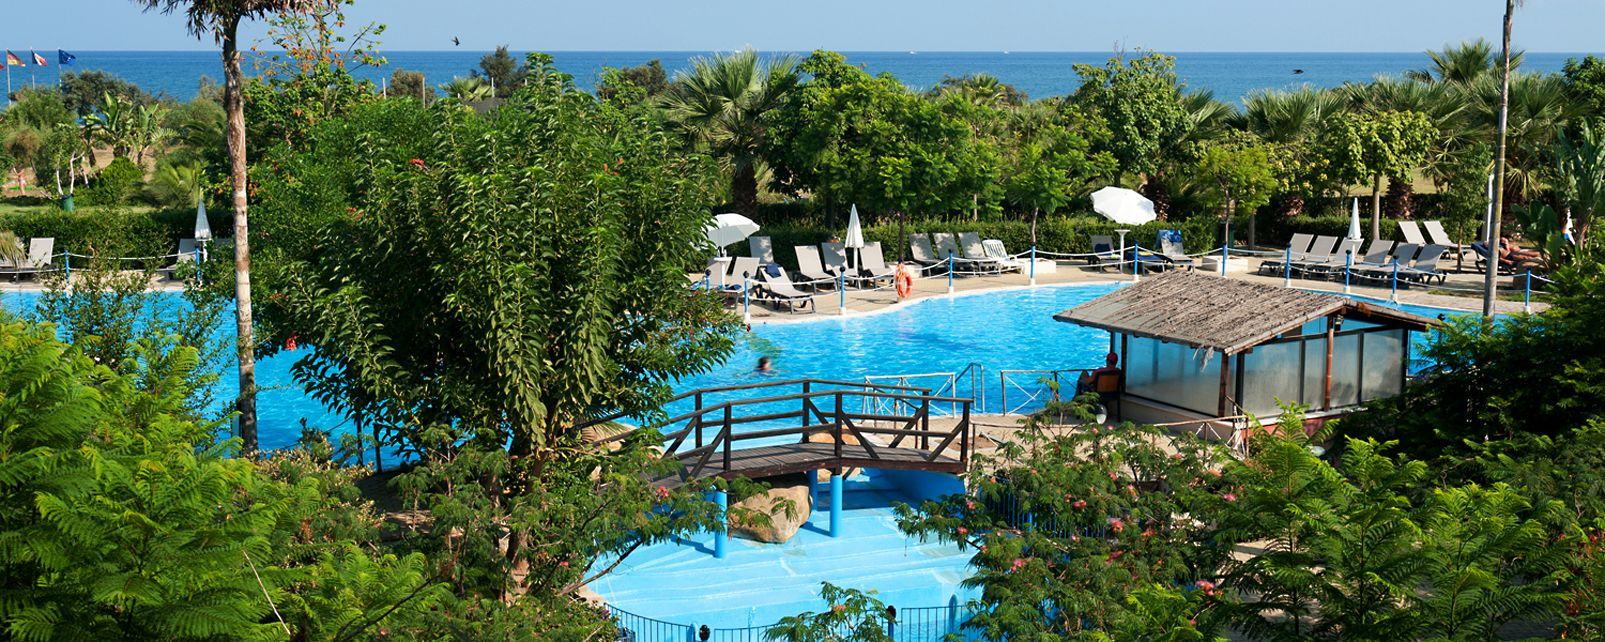 Hotel Fiesta Garden Beach in Campofelice di Roccella